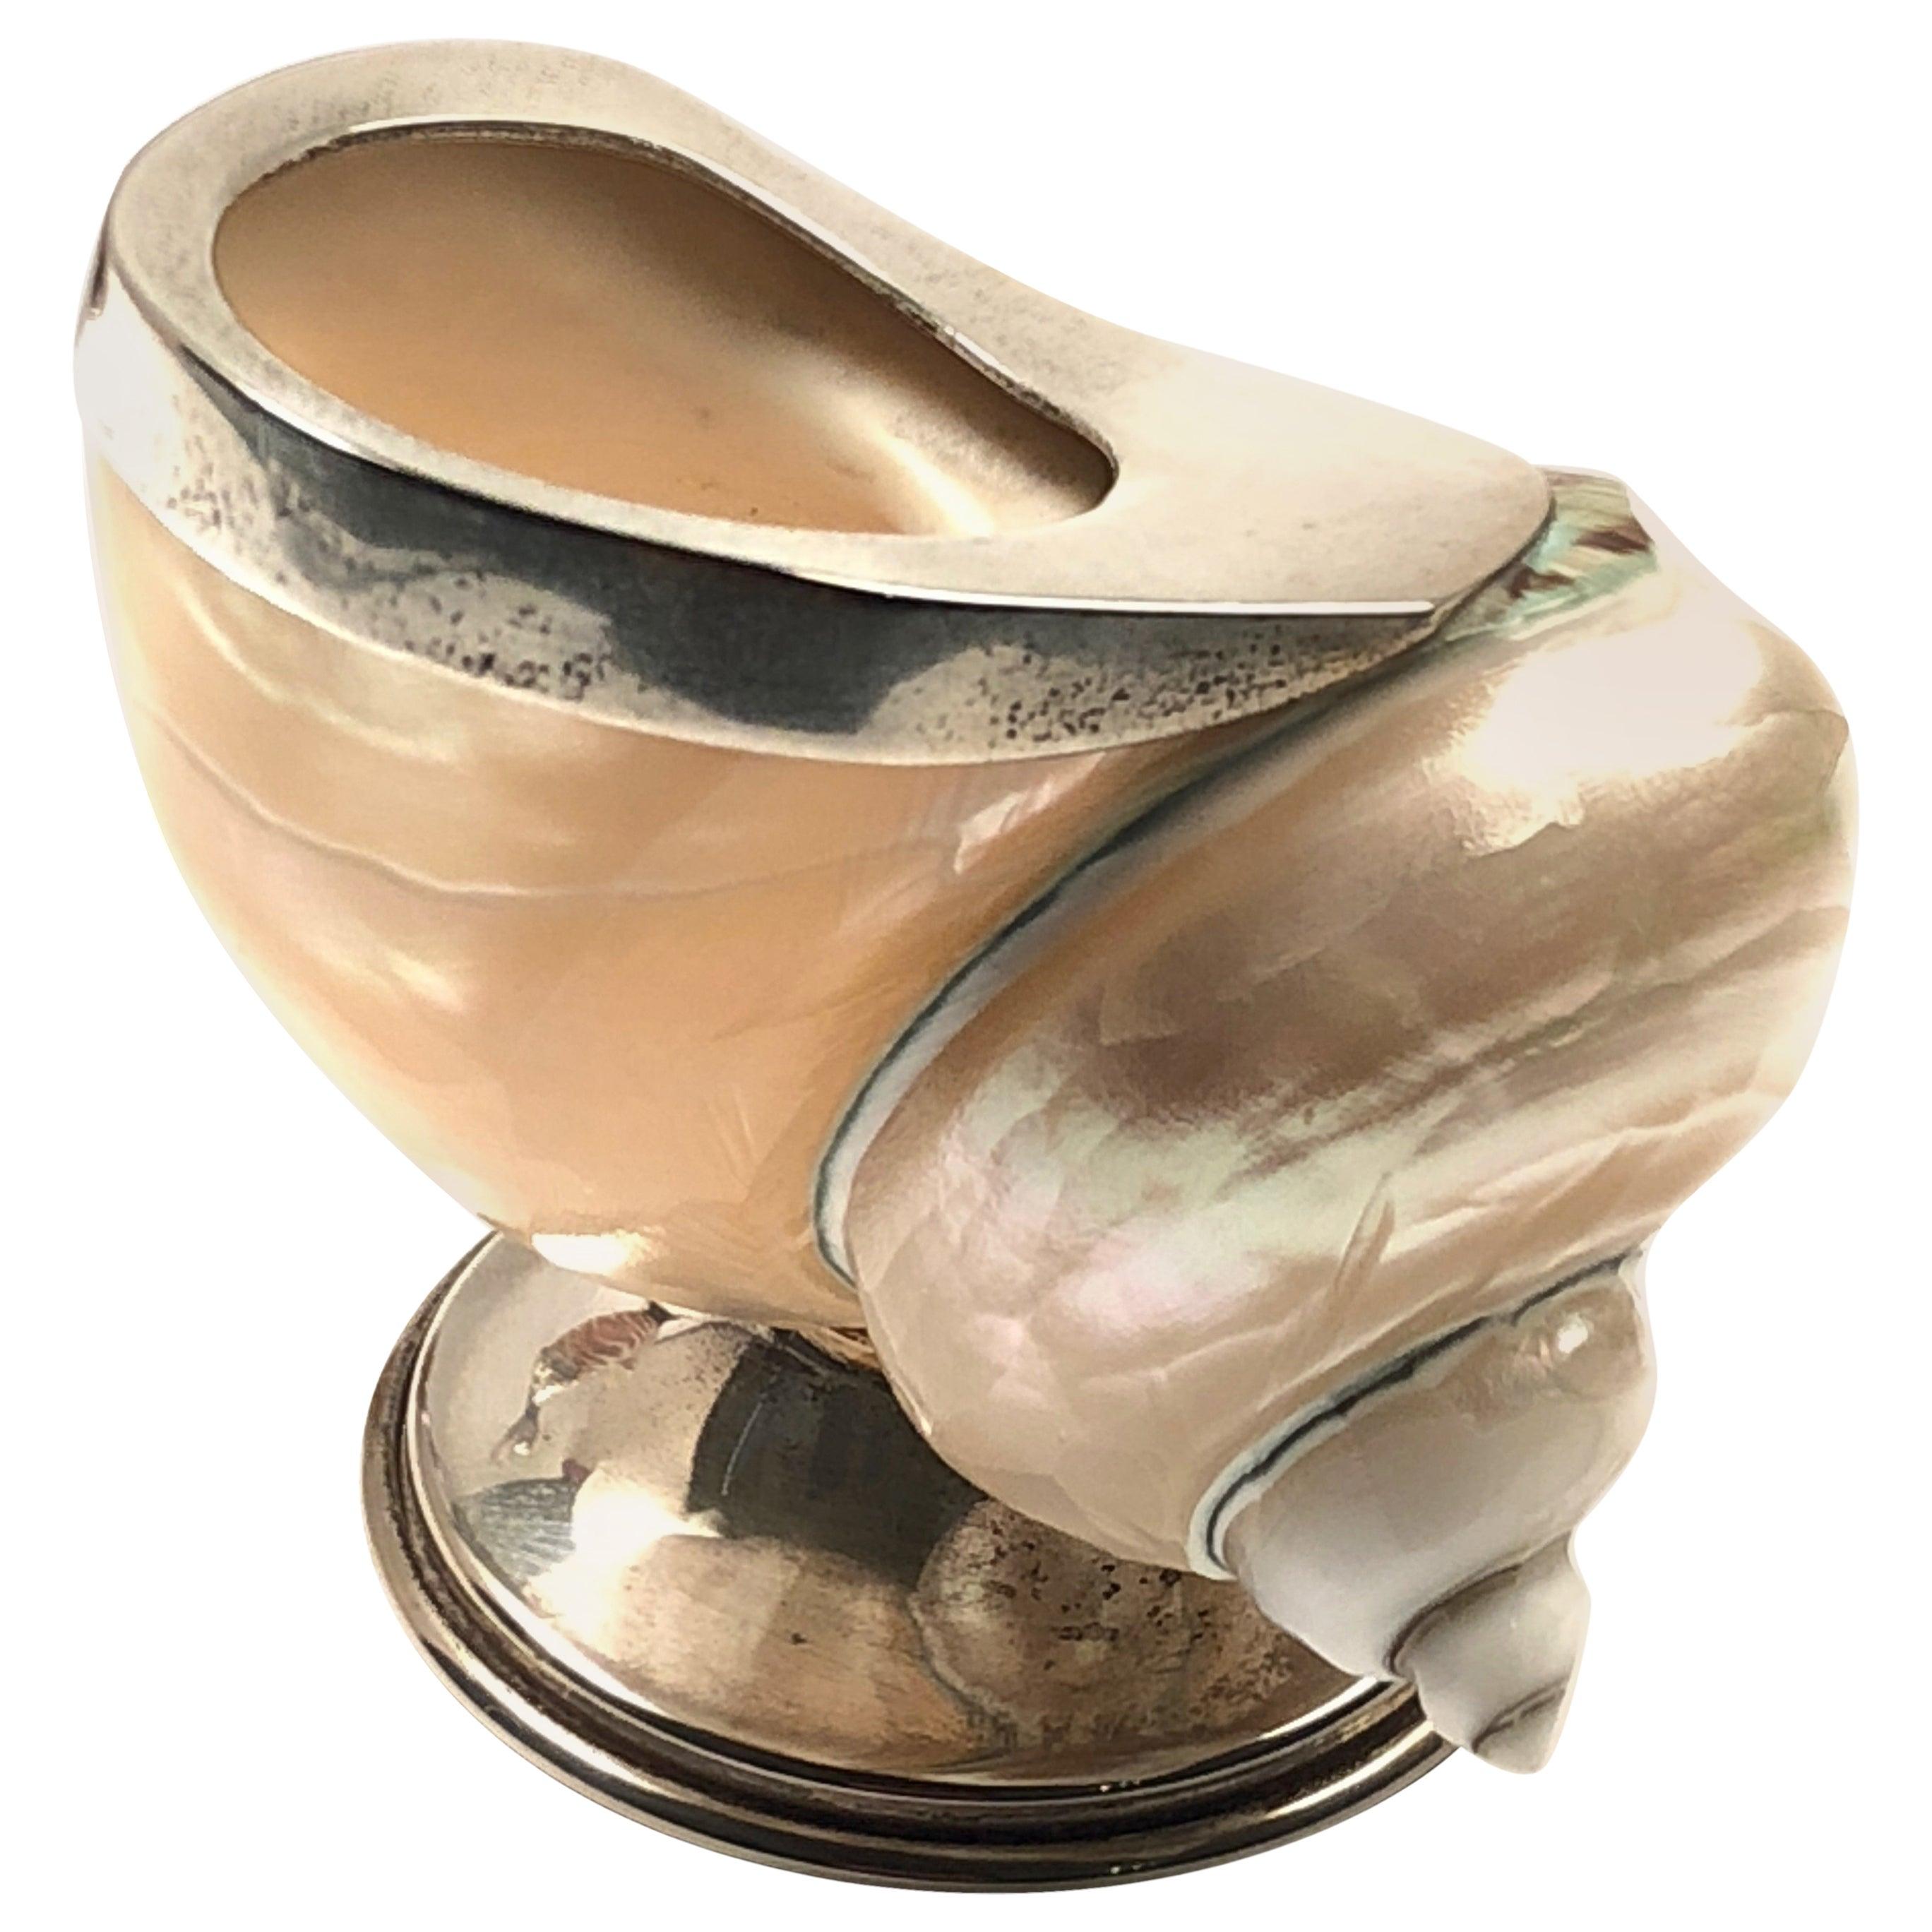 Rare Binazzi Shell Trinket Bowl Sculpture, 1970s, Italy